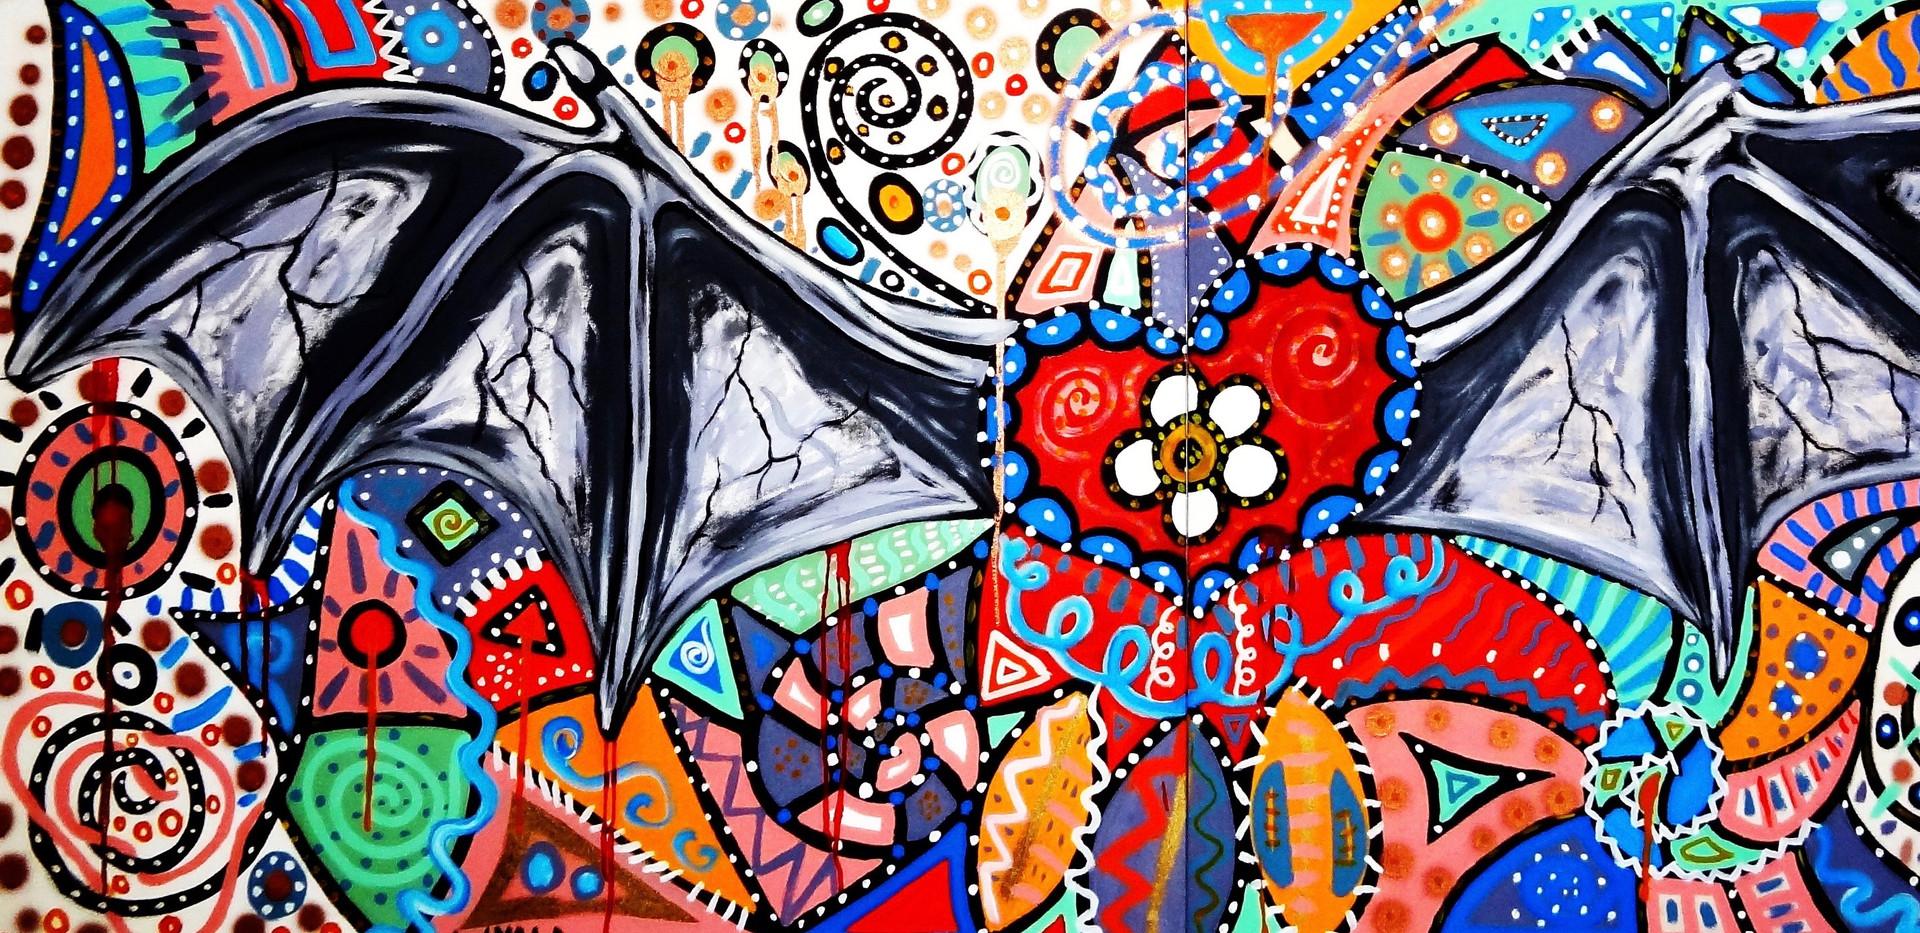 Corazon de Murcielago. Mixed Media on Canvas.